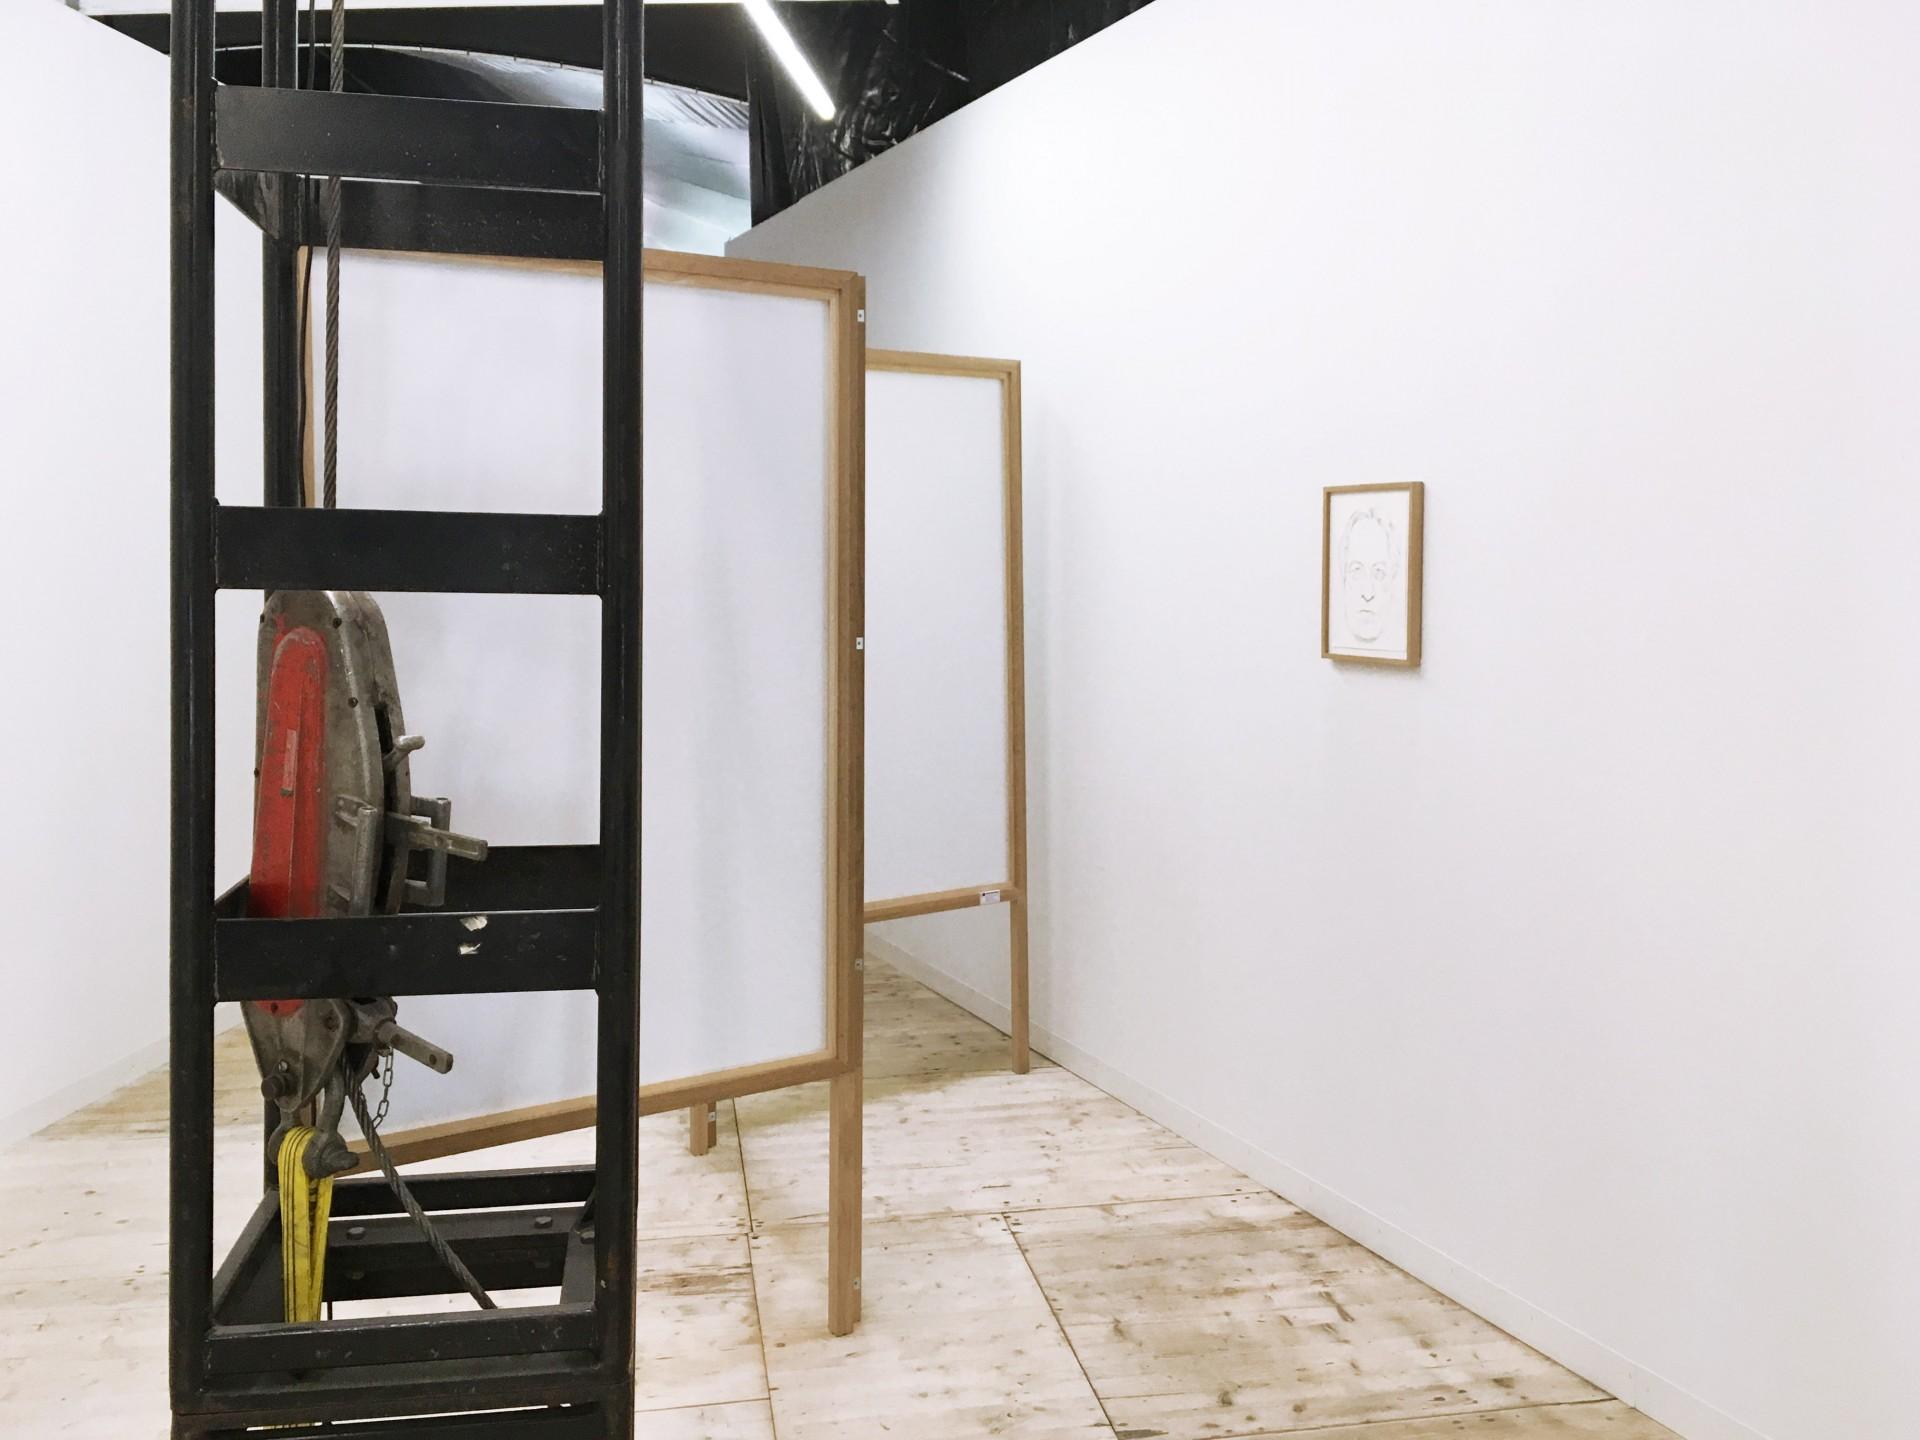 Ginerva Gambino Alex Wissel at Liste Art Fair Basel 2018